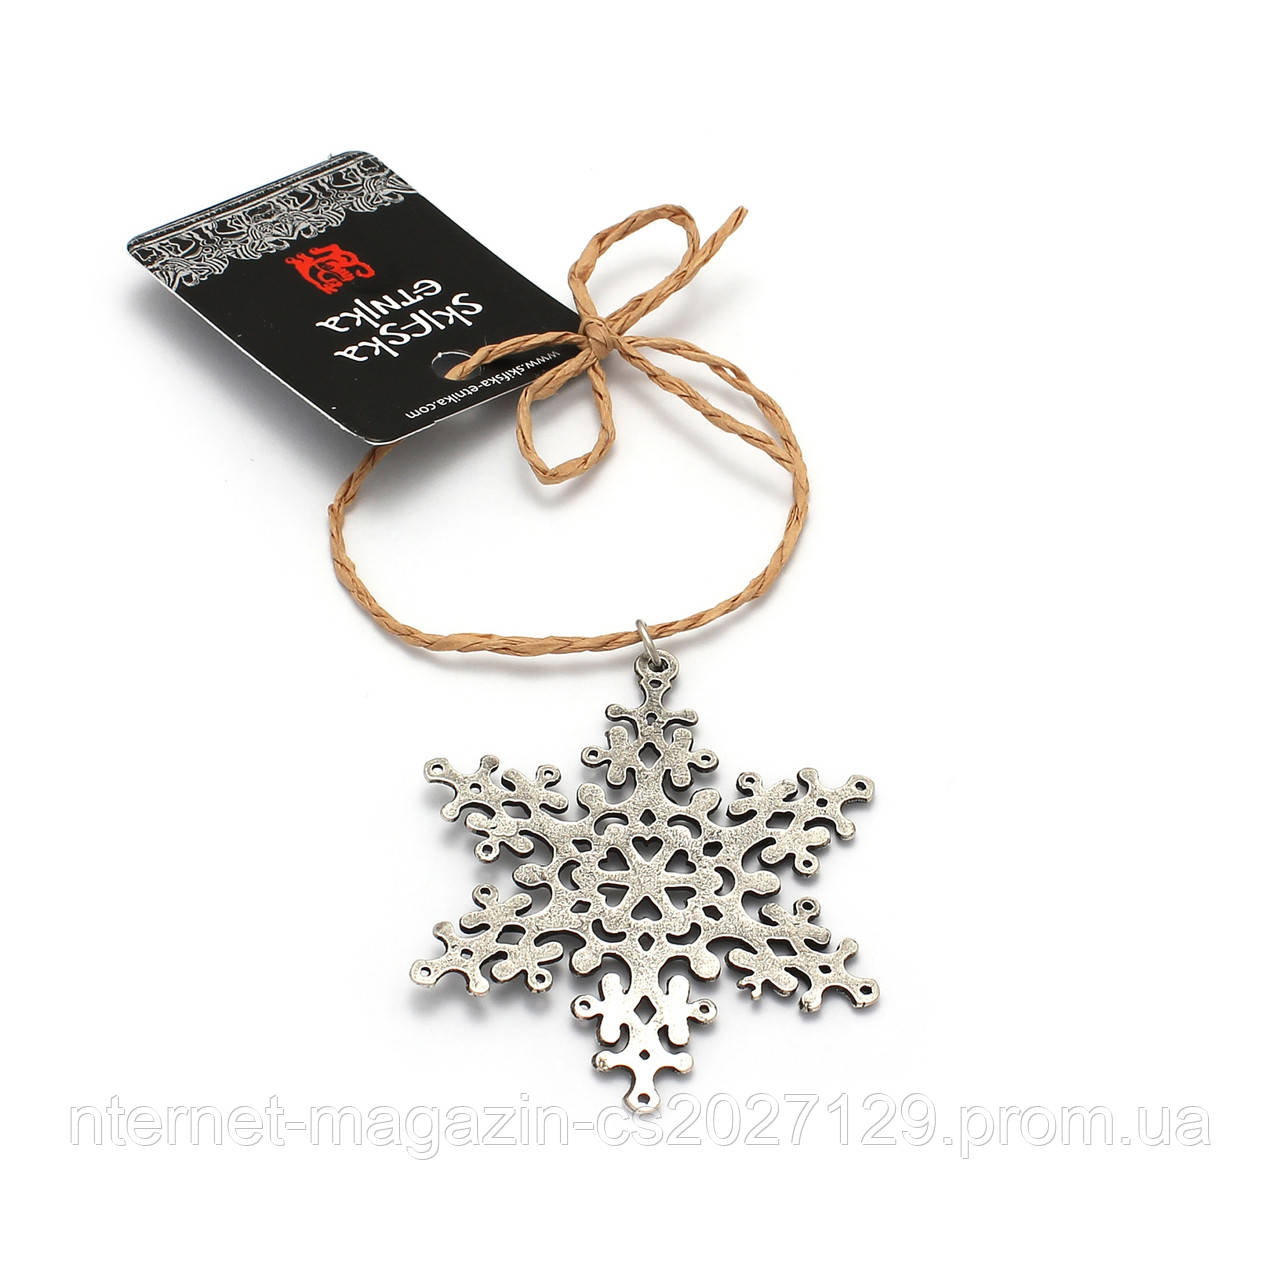 Игрушка Снежинка, Зимняя Сказка (серебро)